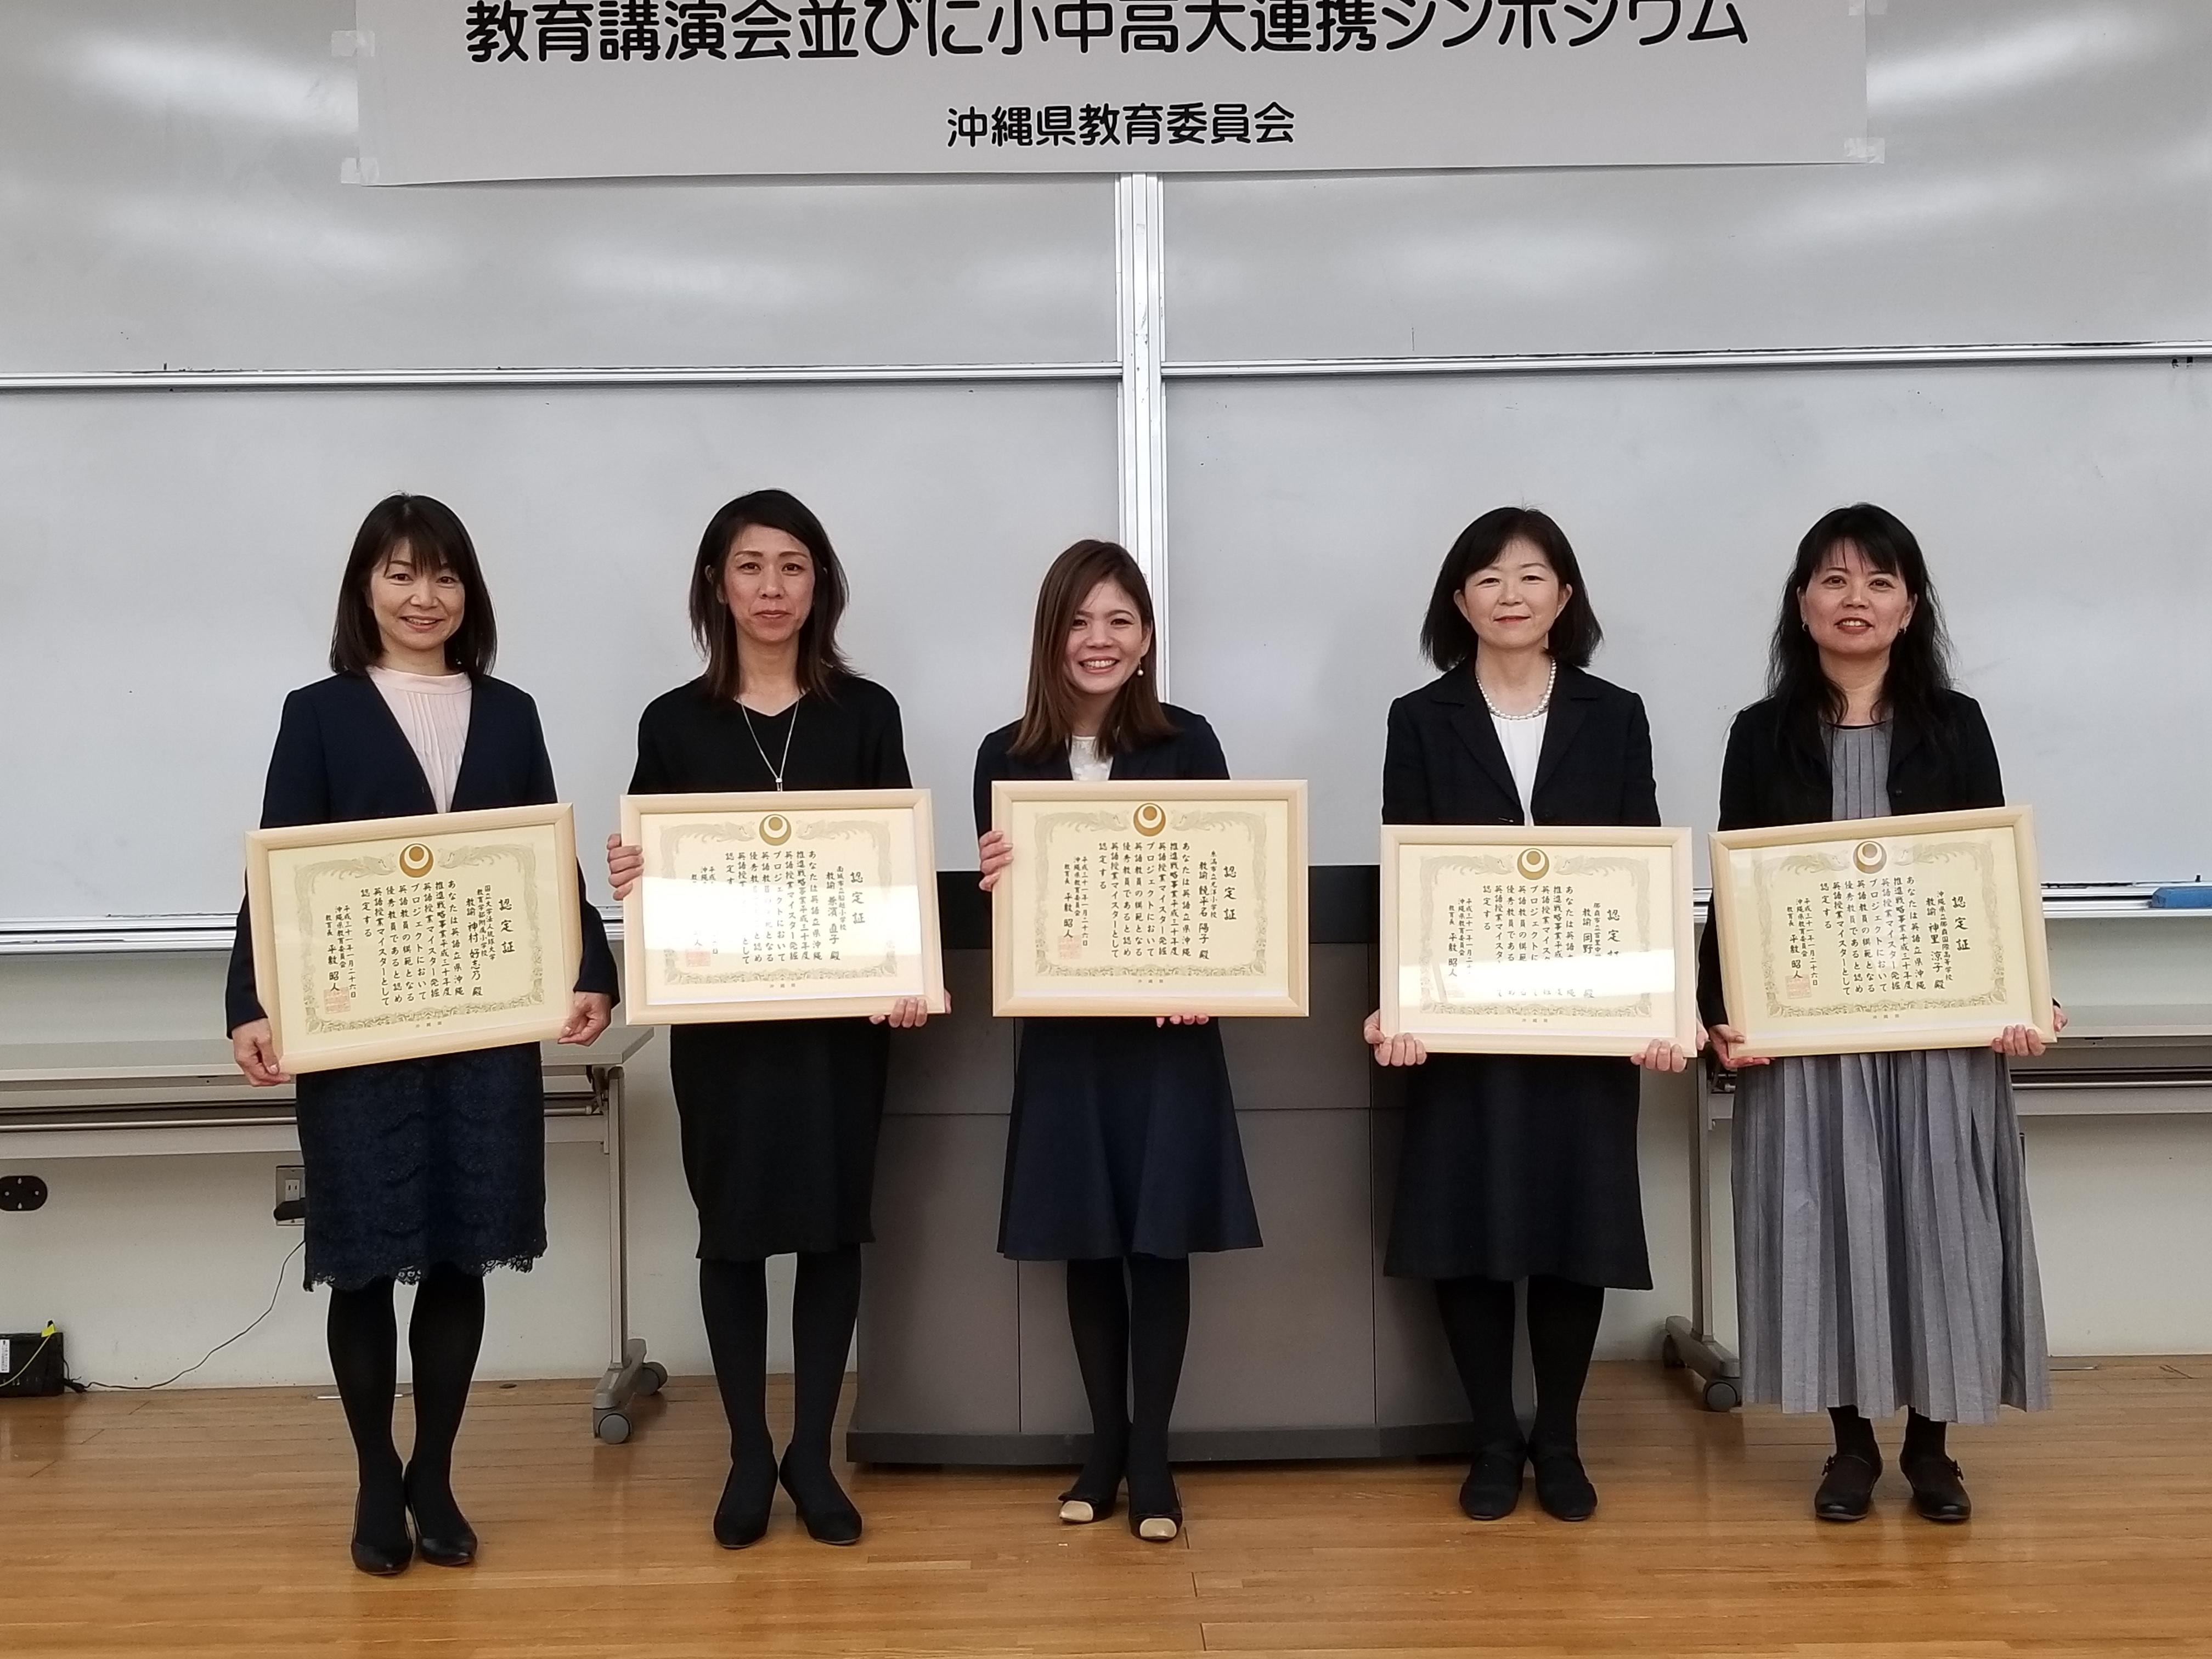 Prefectural Board of Education Okinawa Board of Education